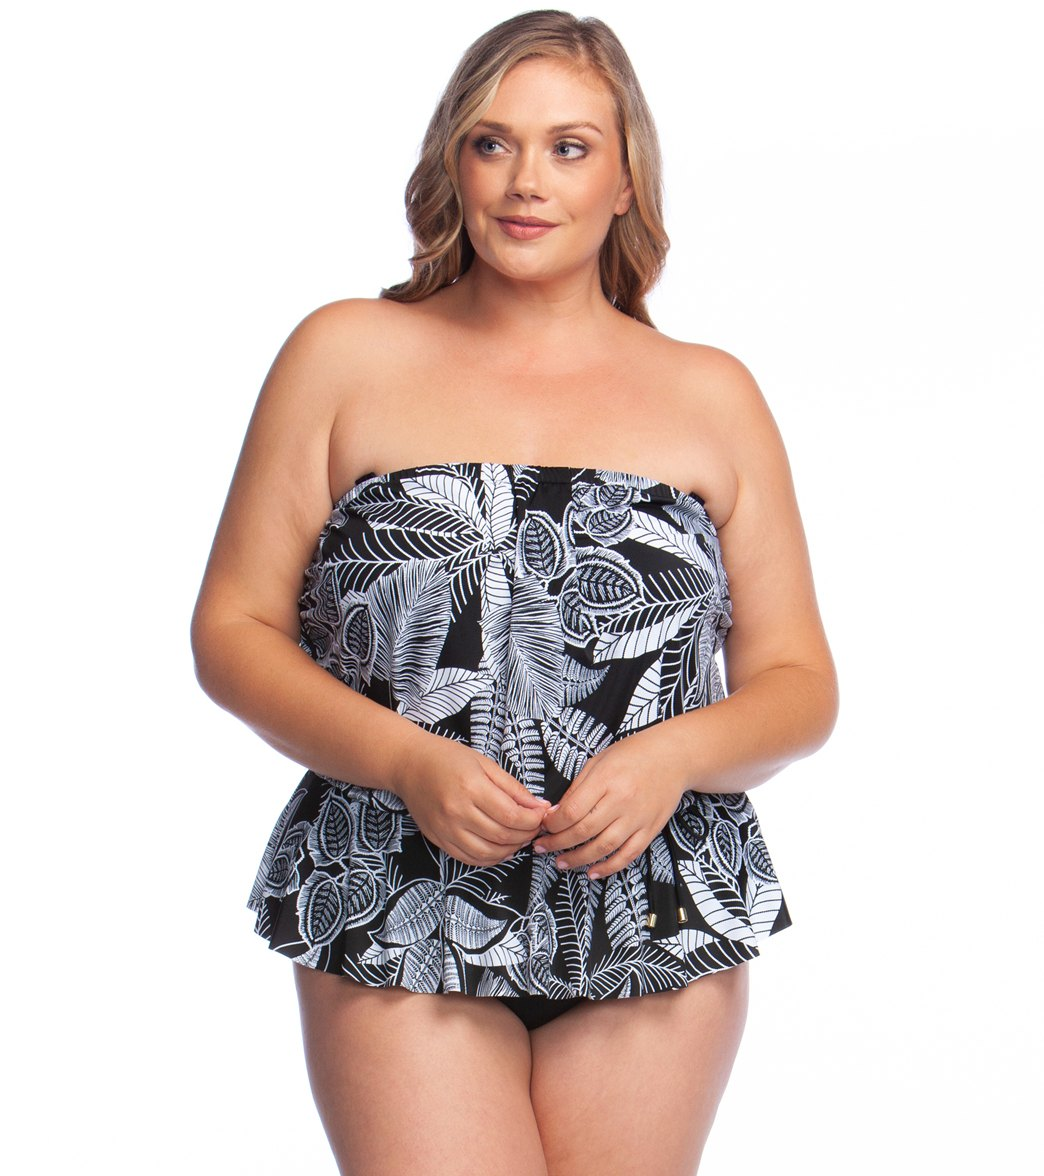 bb85c5369dc Maxine Plus Size Linework Peplum Tankini Top at SwimOutlet.com ...